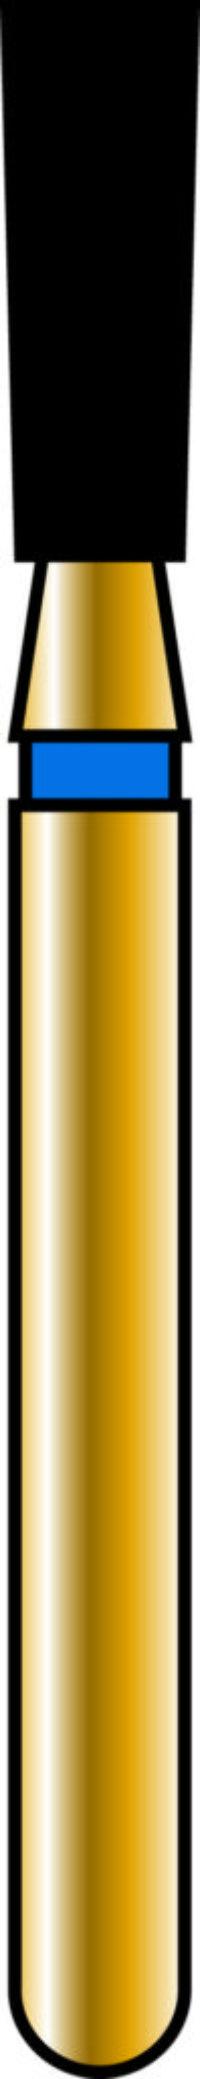 Inverted Cone 18-5mm Gold Diamond Bur - Coarse Grit